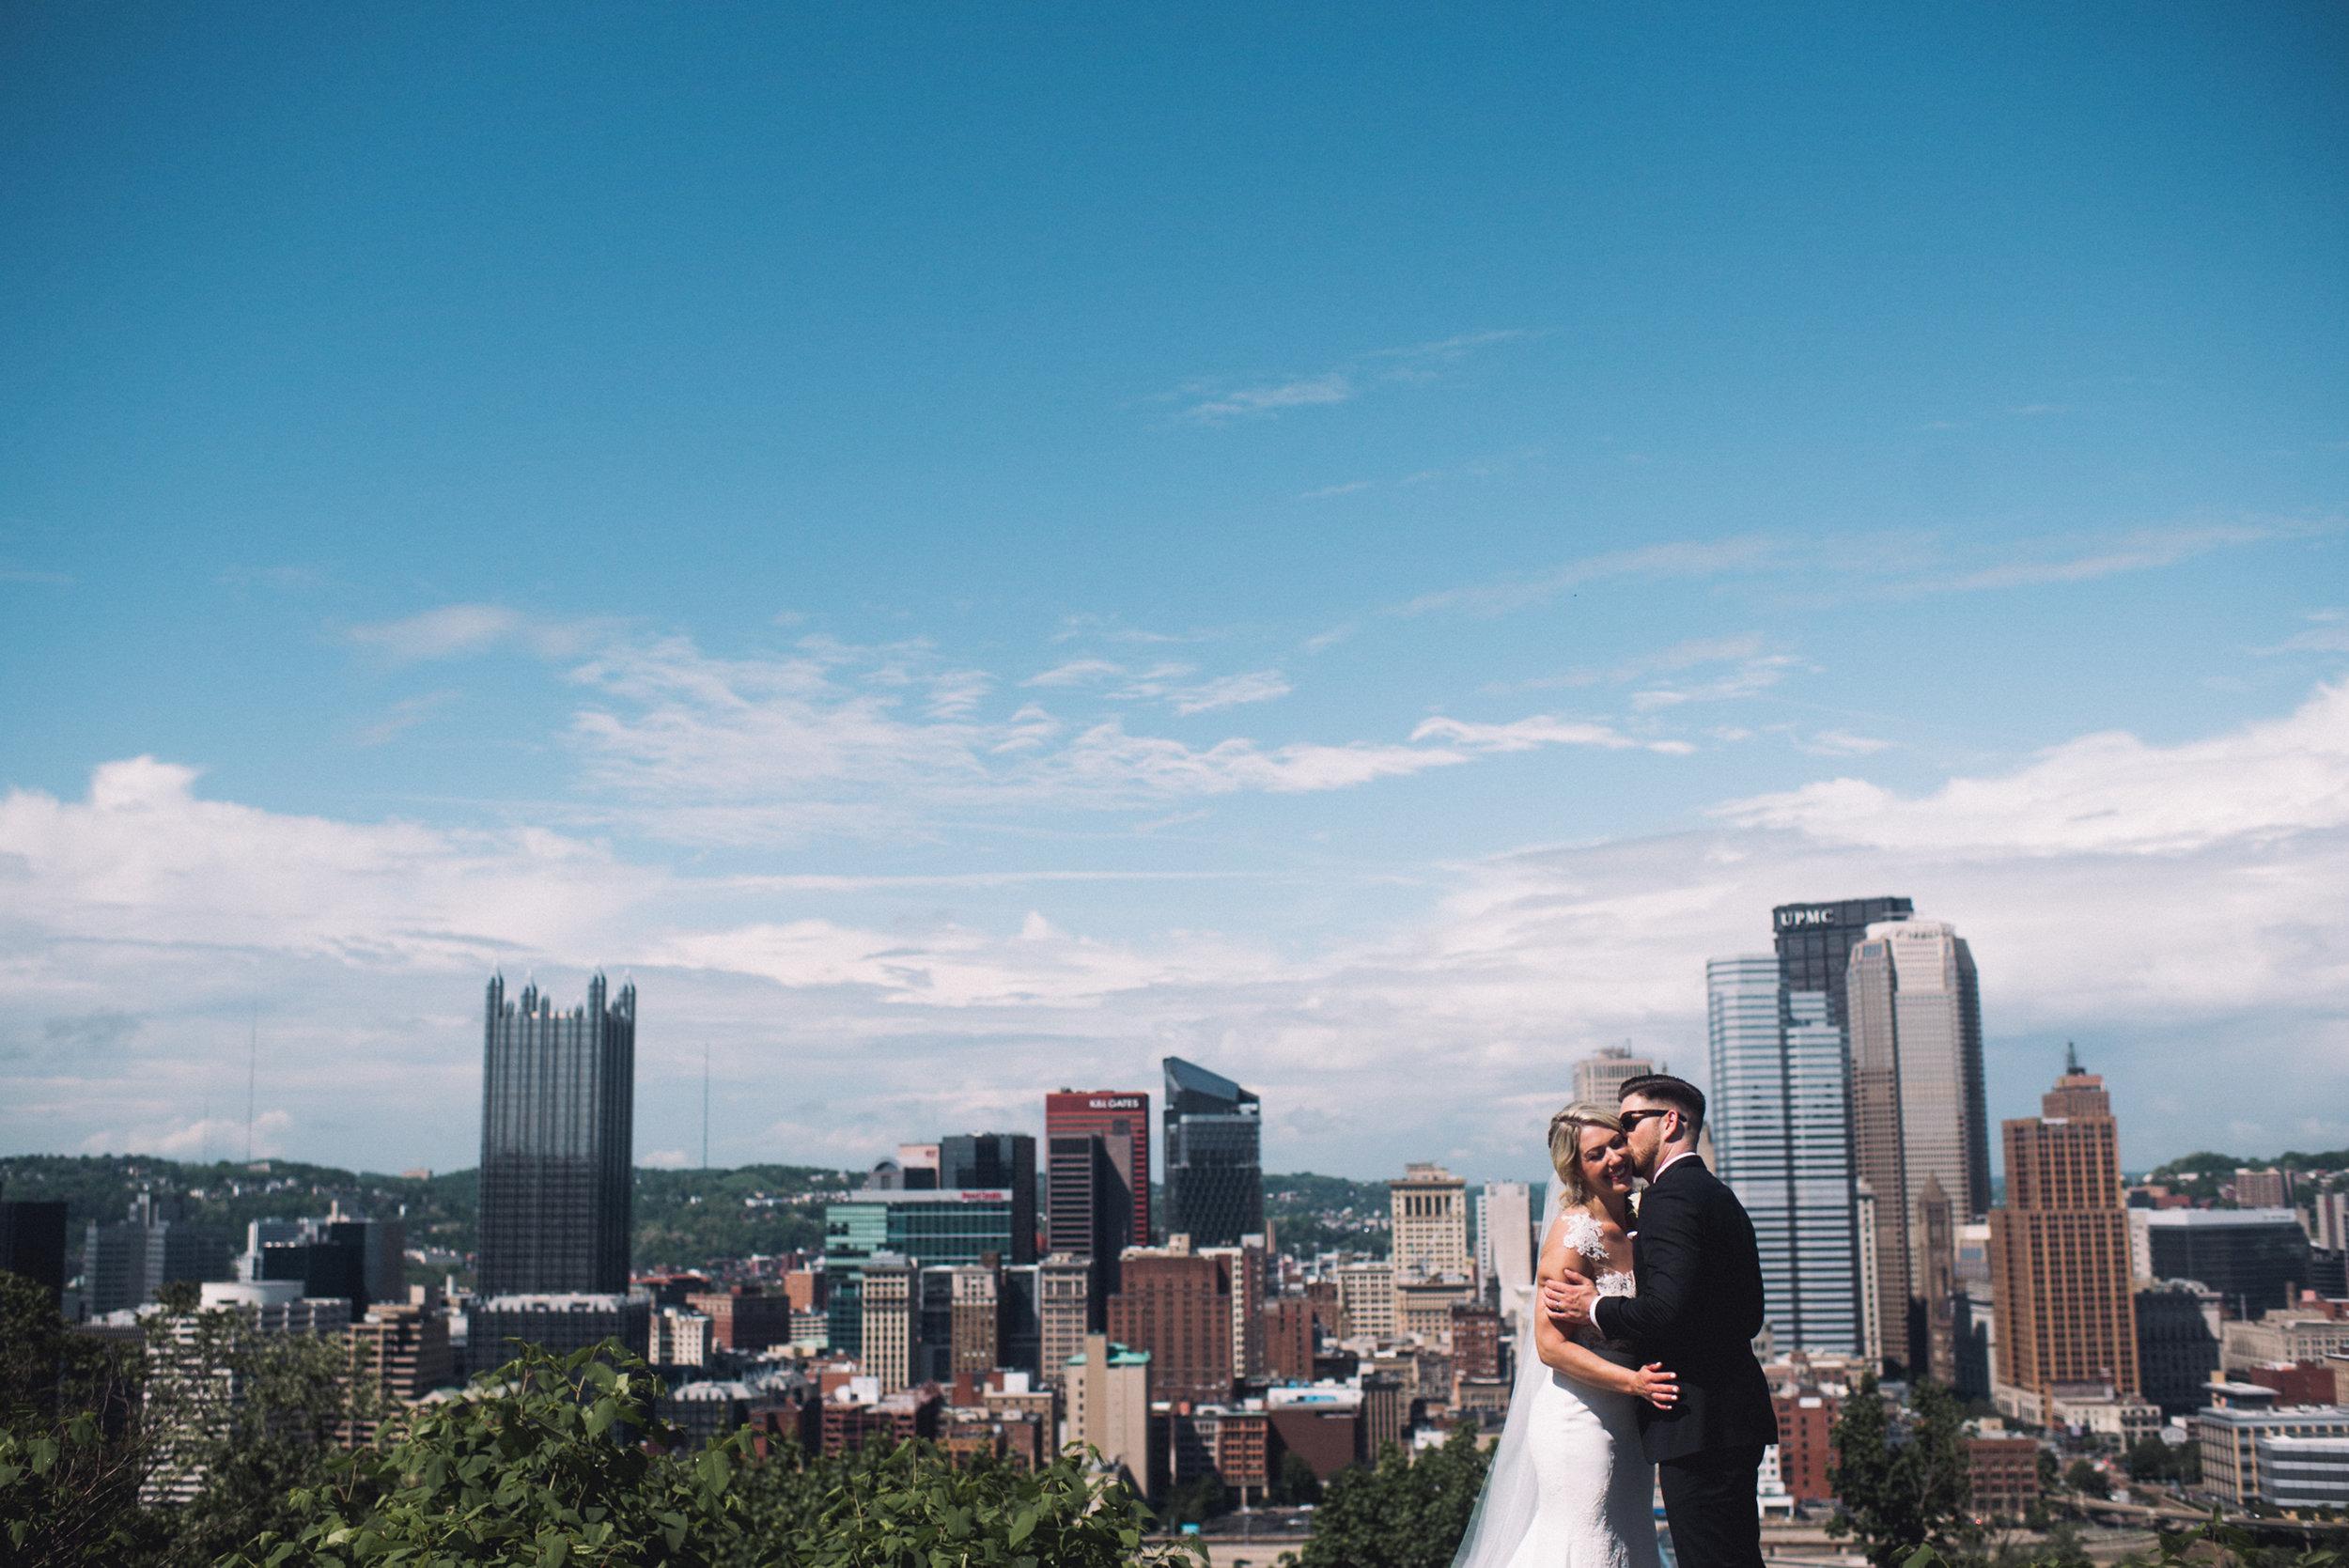 Pittsburgh Pennsylvania New York NYC Wedding Photographer Photojournalist Luxury Downtown Opera - Stirpe 953.jpg